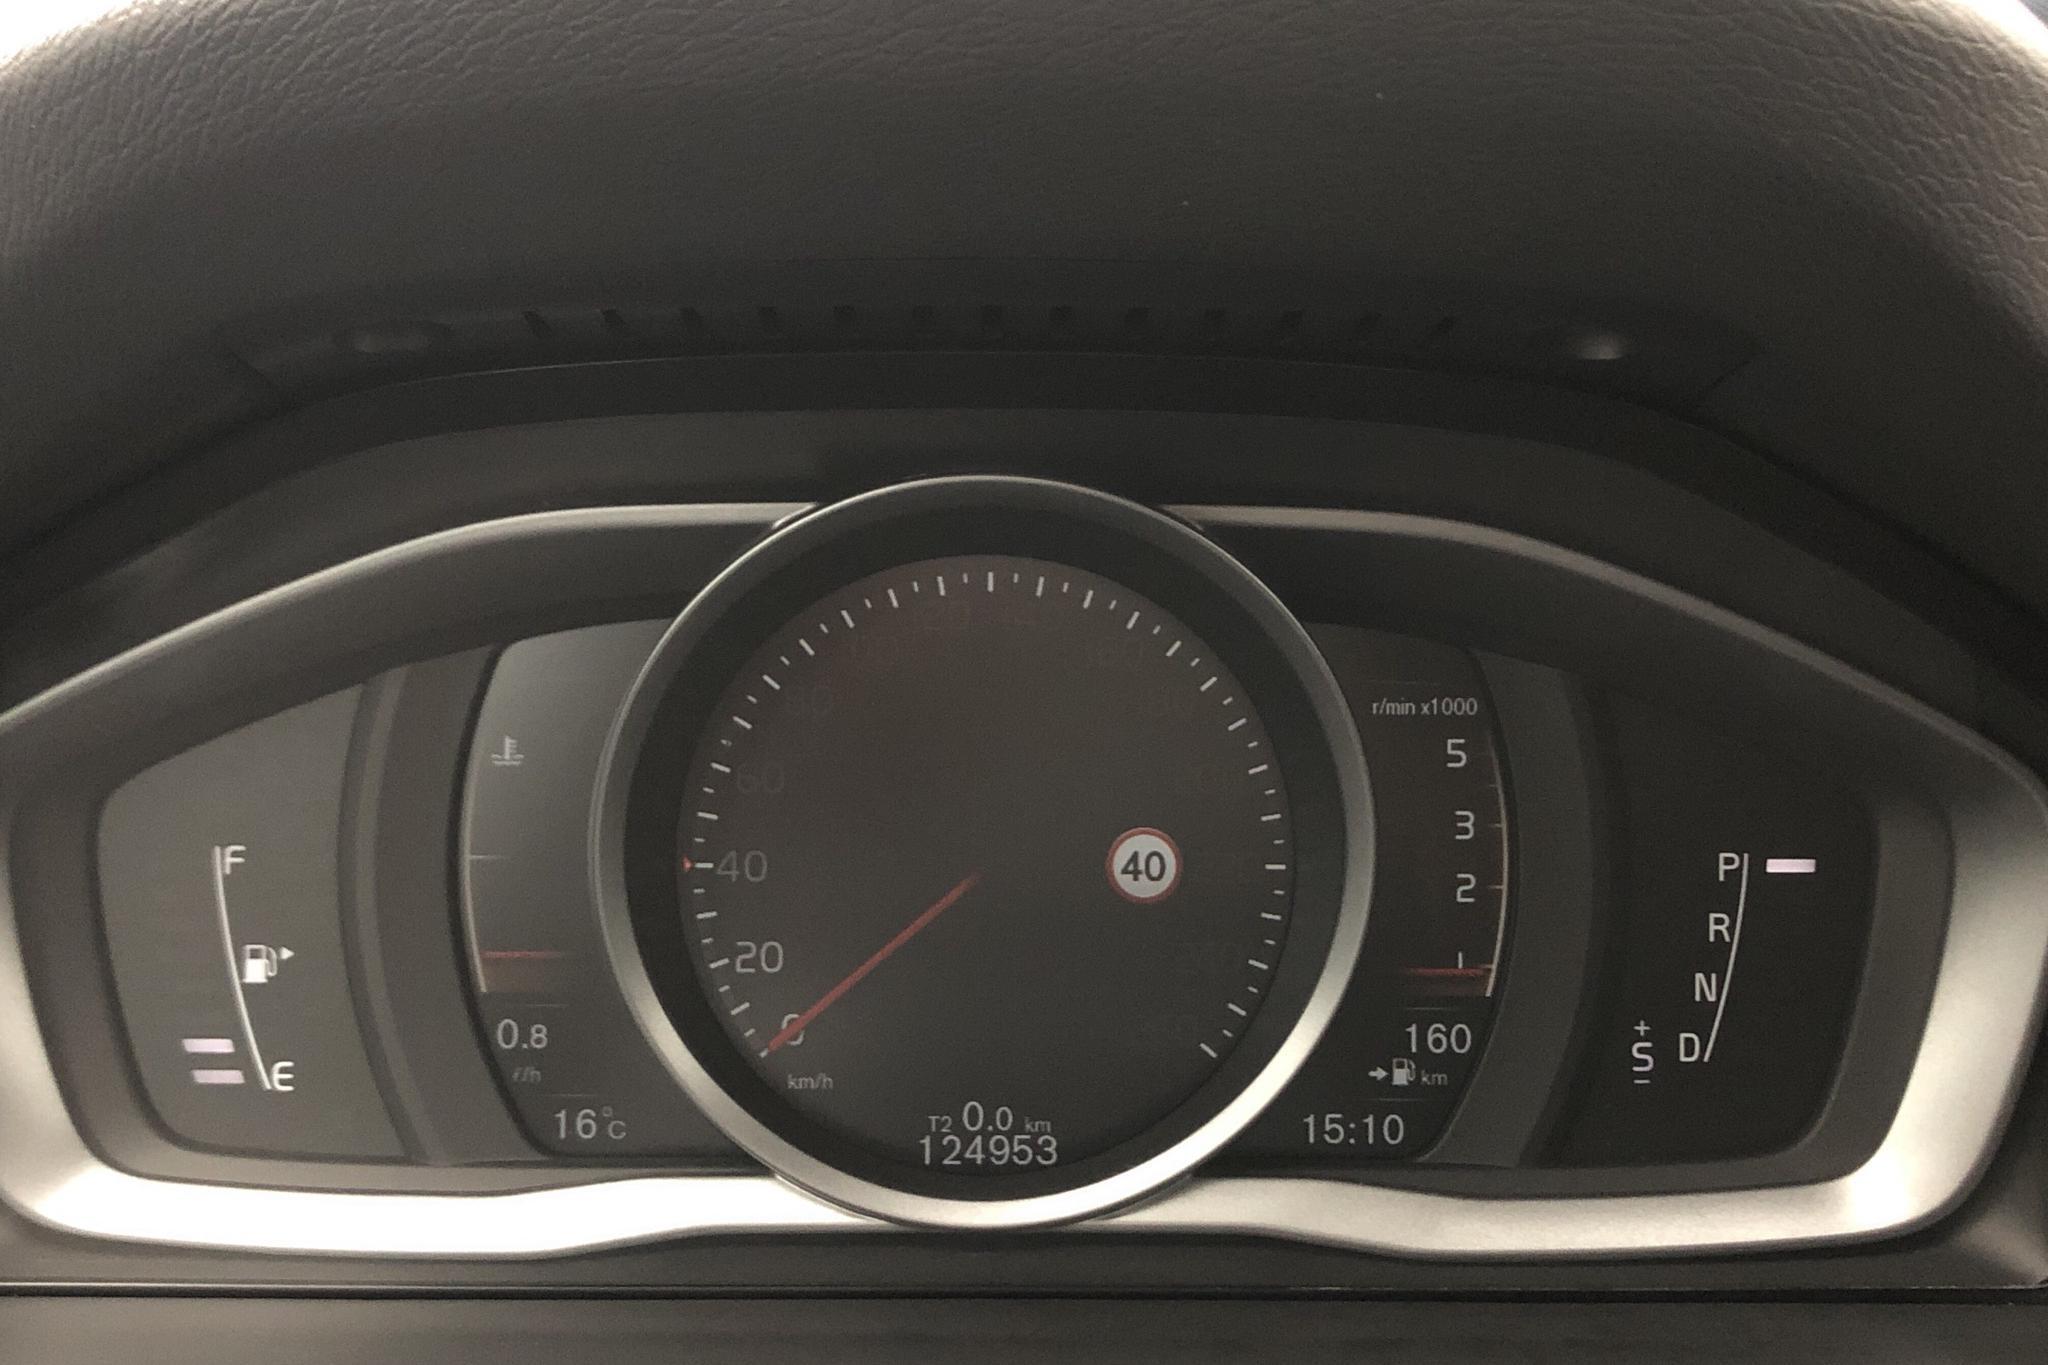 Volvo XC70 II D4 AWD (181hk) - 124 950 km - Automatic - black - 2016